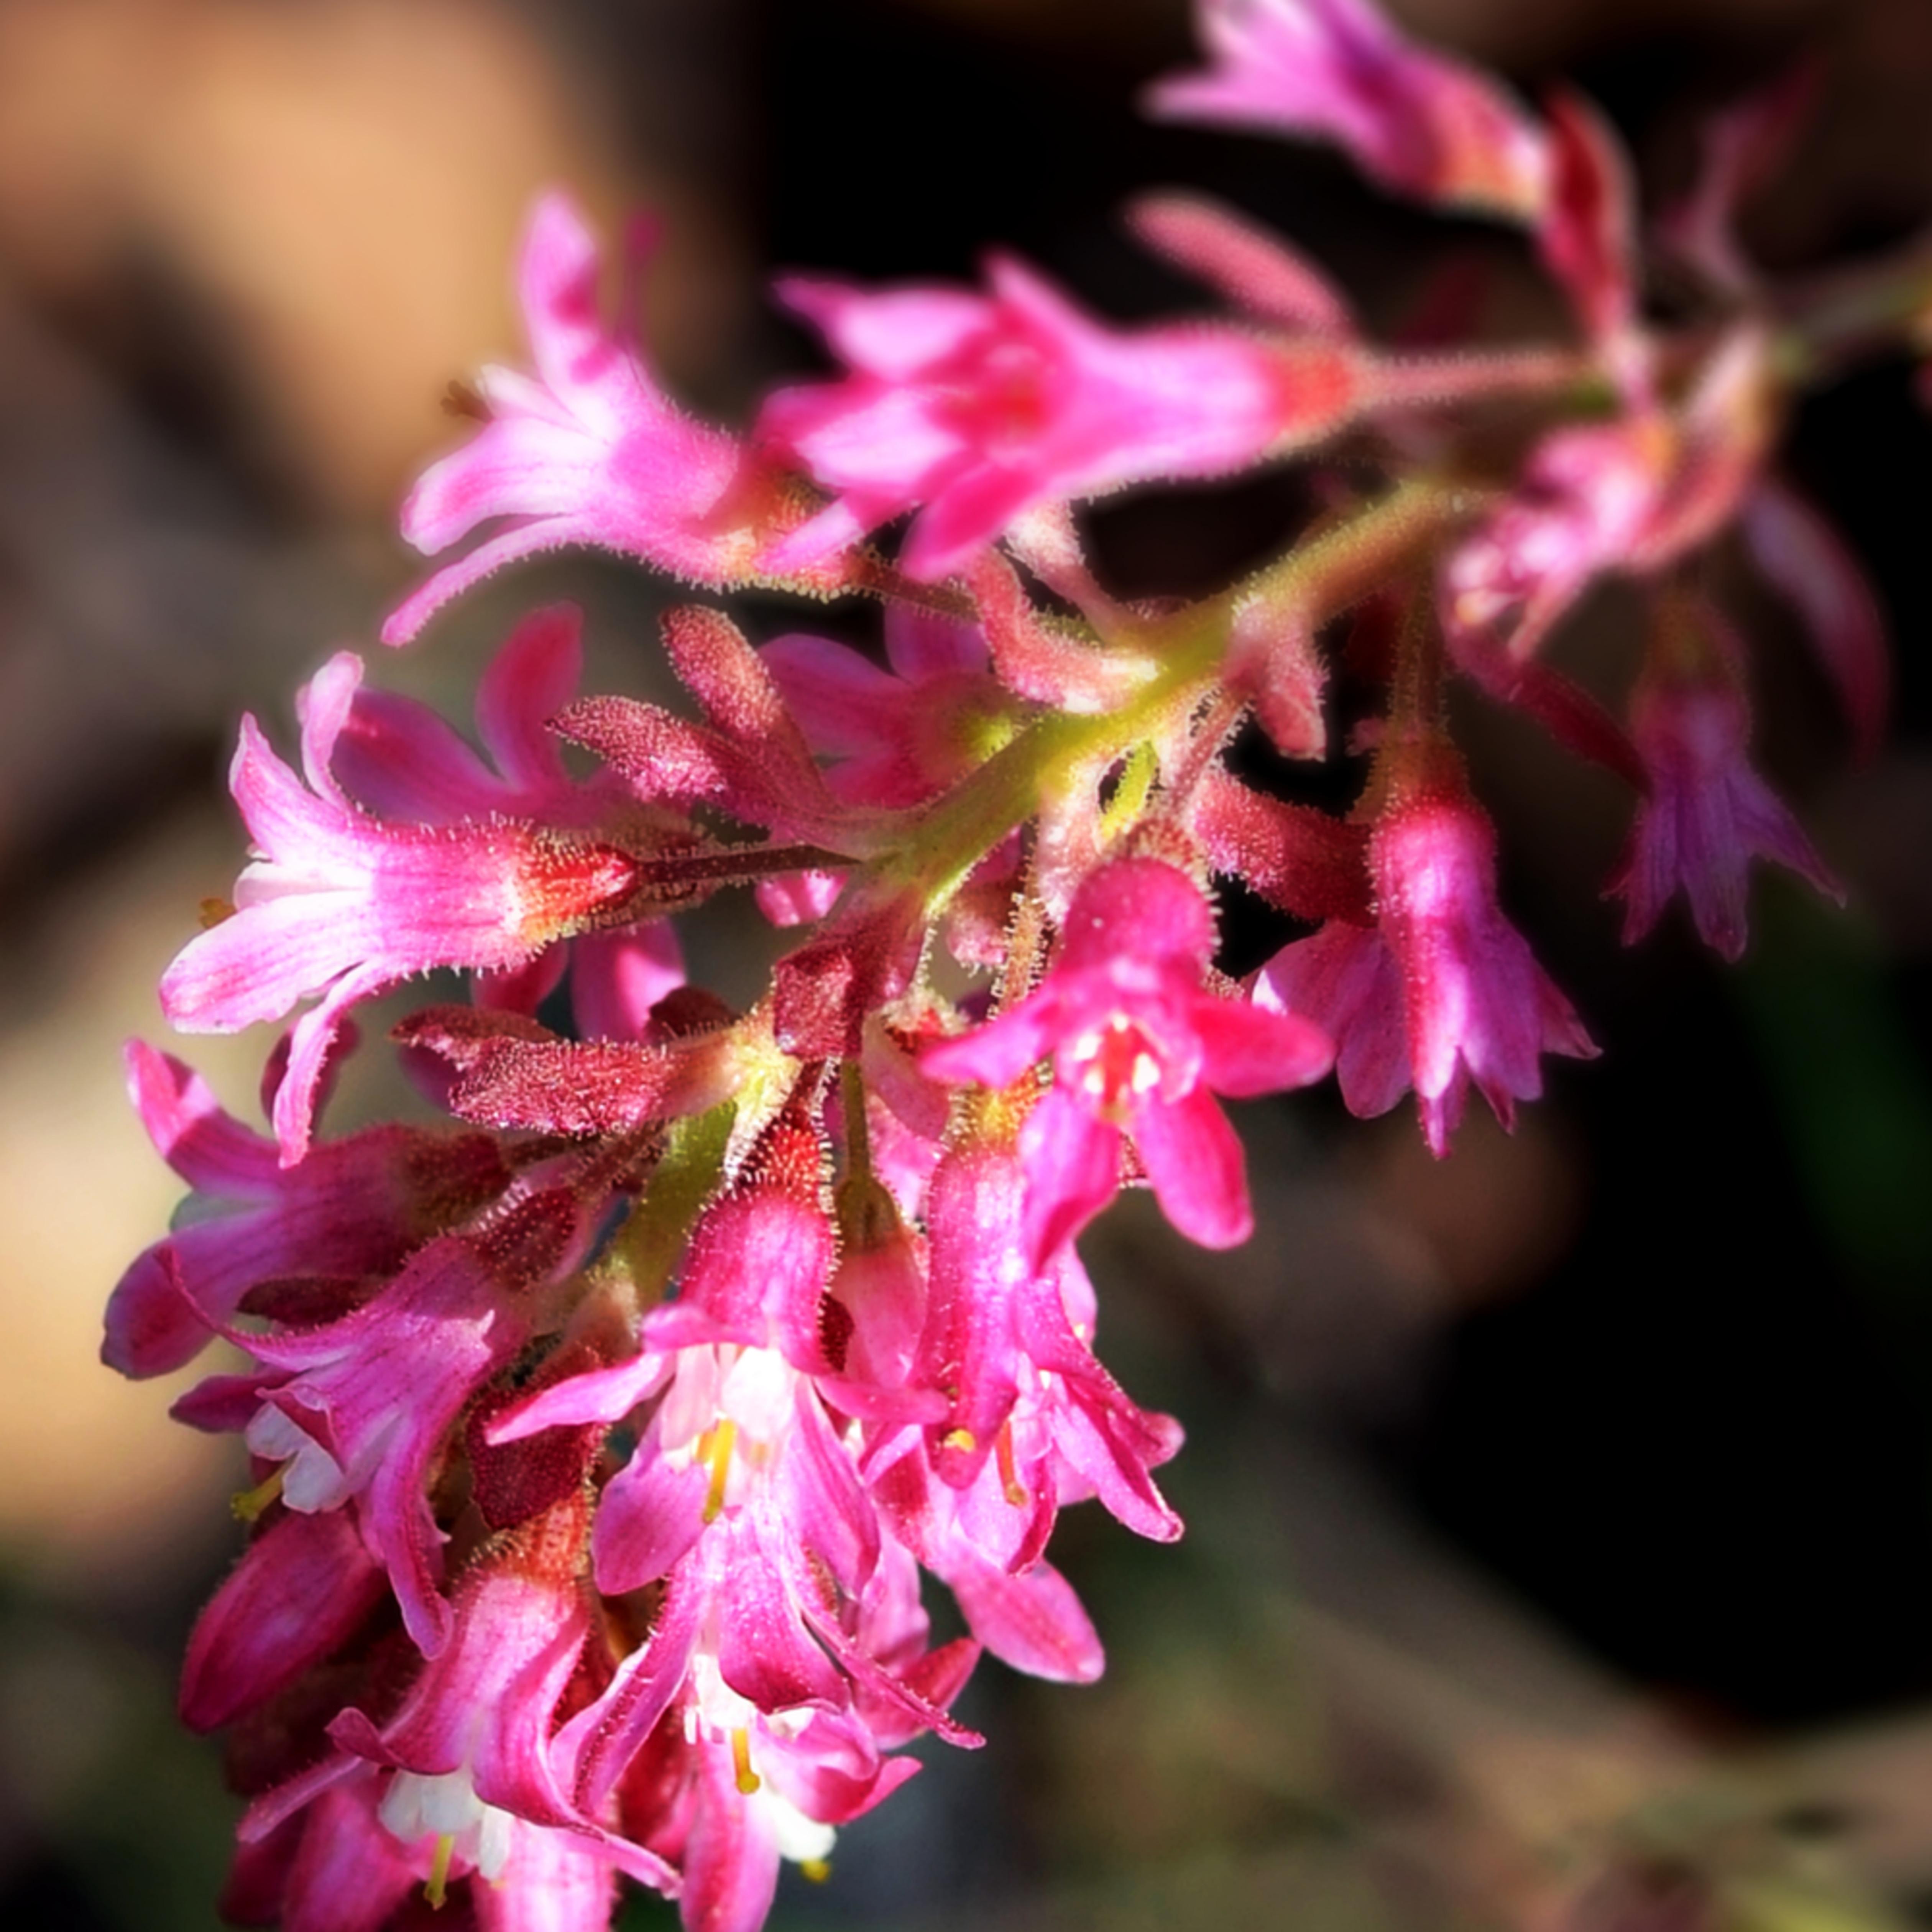 Wild flower in pink jwe7dp